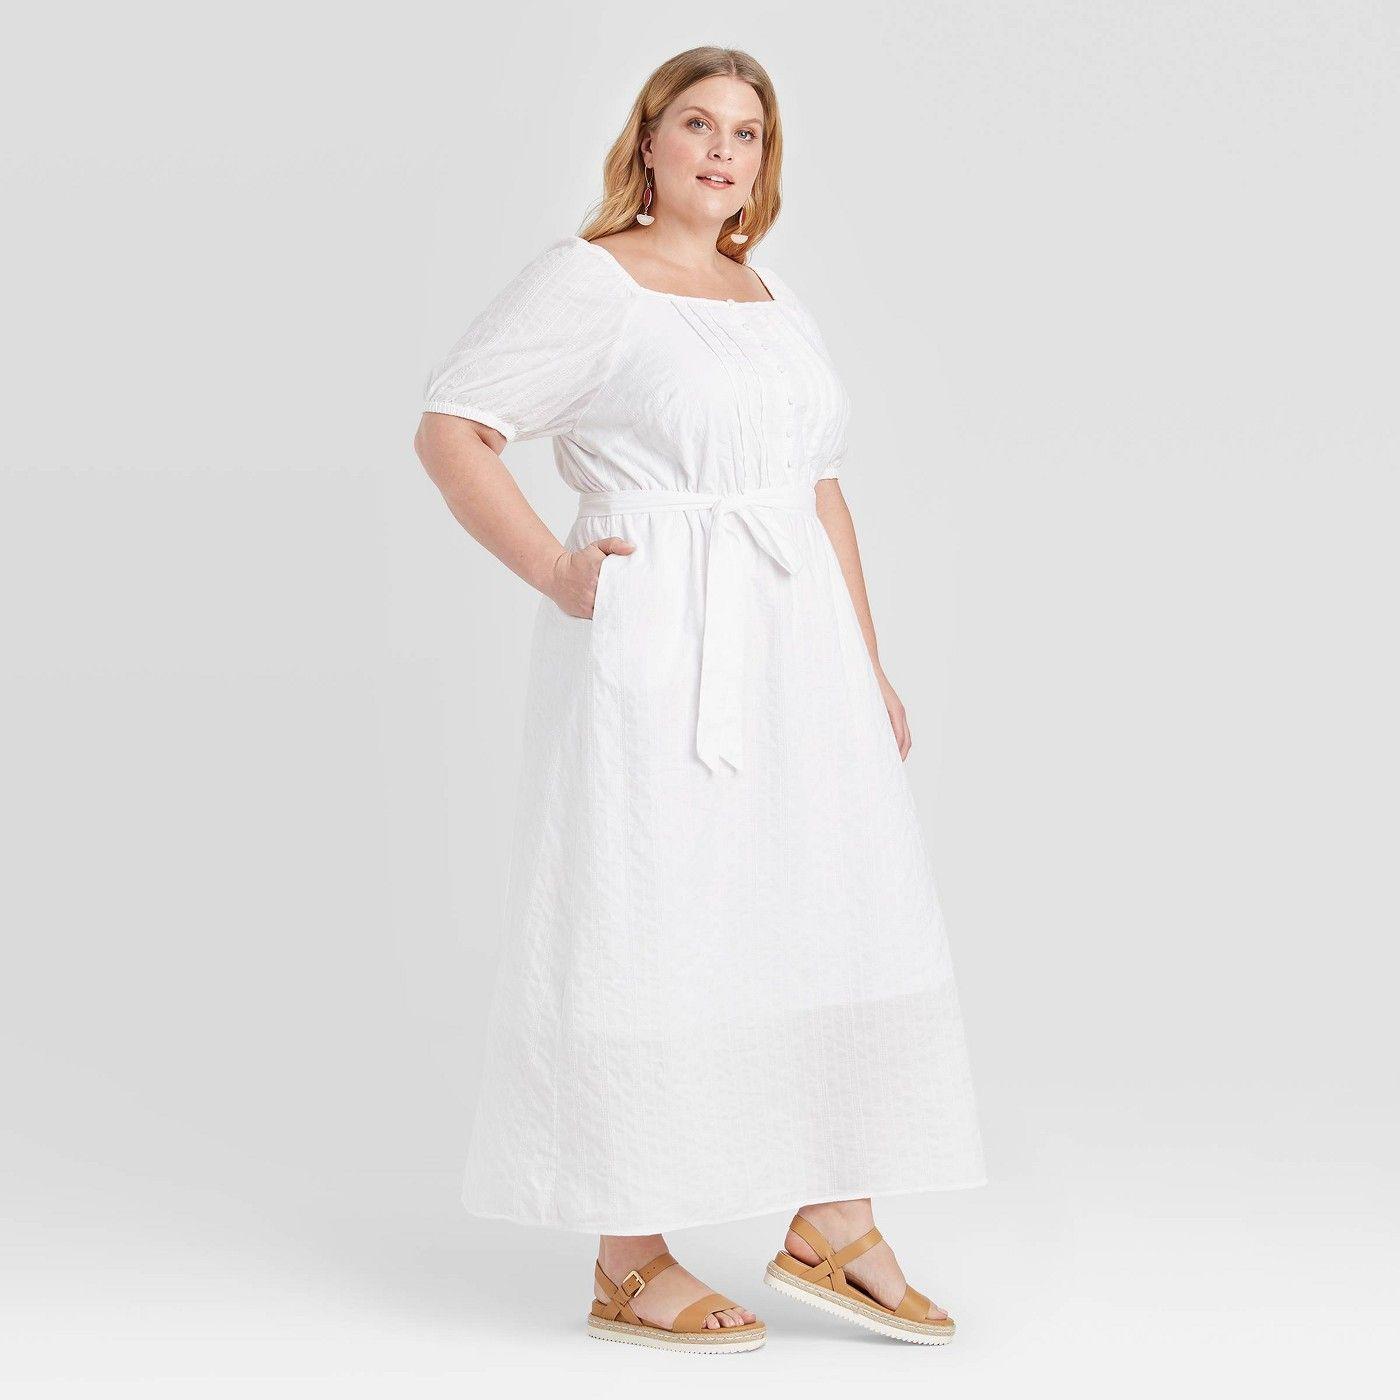 Women S Plus Size Short Sleeve Textured Button Front Maxi Dress Ava Viv White Sponsored Slee Button Front Maxi Dress Maxi Dress Women S Plus Size Shorts [ 1400 x 1400 Pixel ]